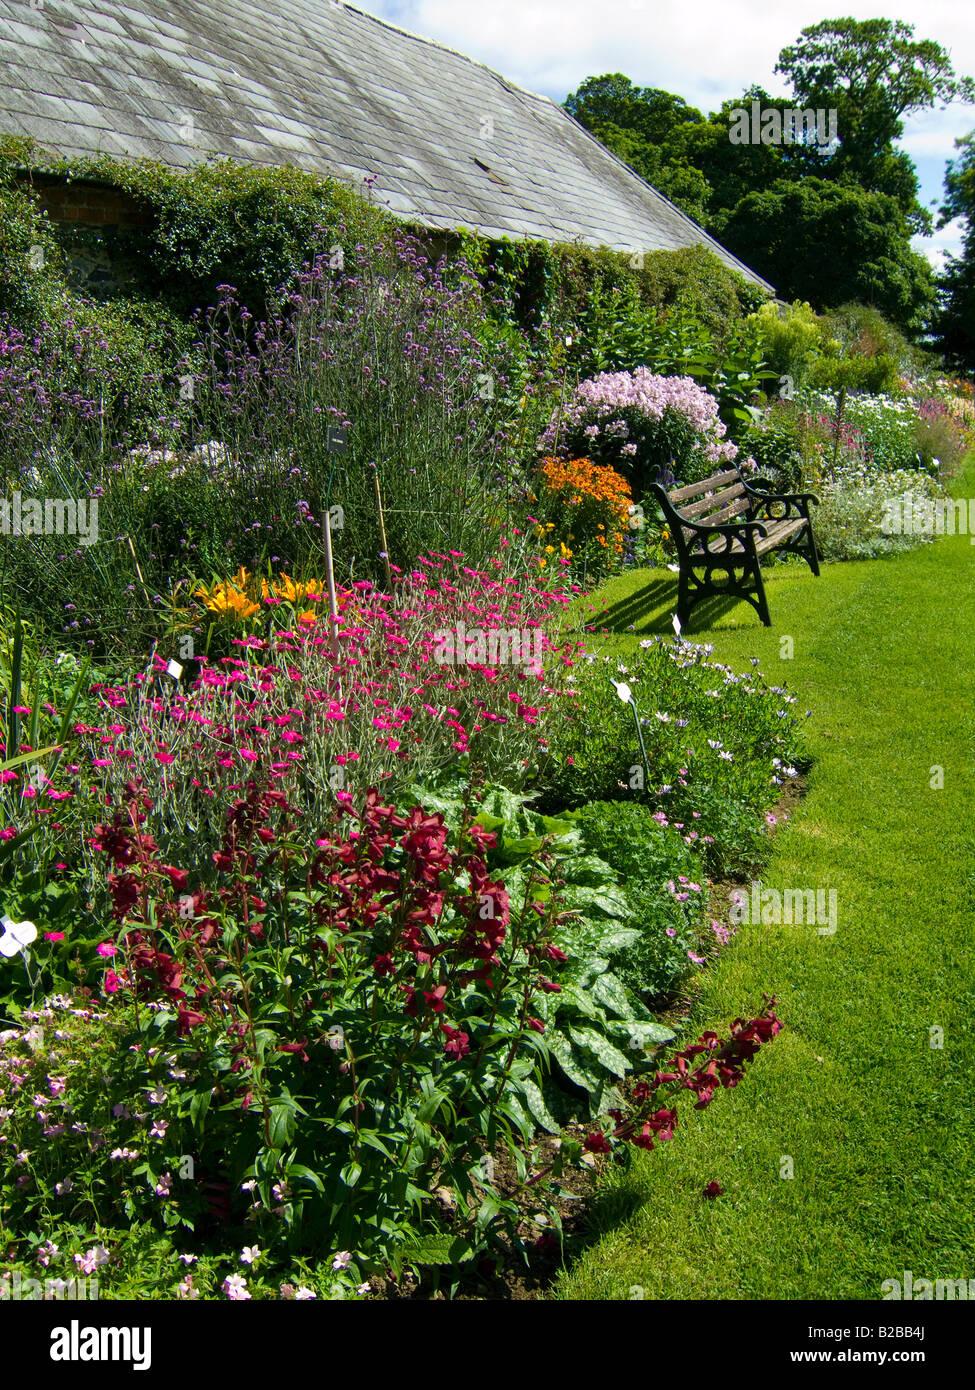 An herbaceous flower border in mid summer - Ardgillan Park near Balbriggan, county Dublin, Ireland - Stock Image